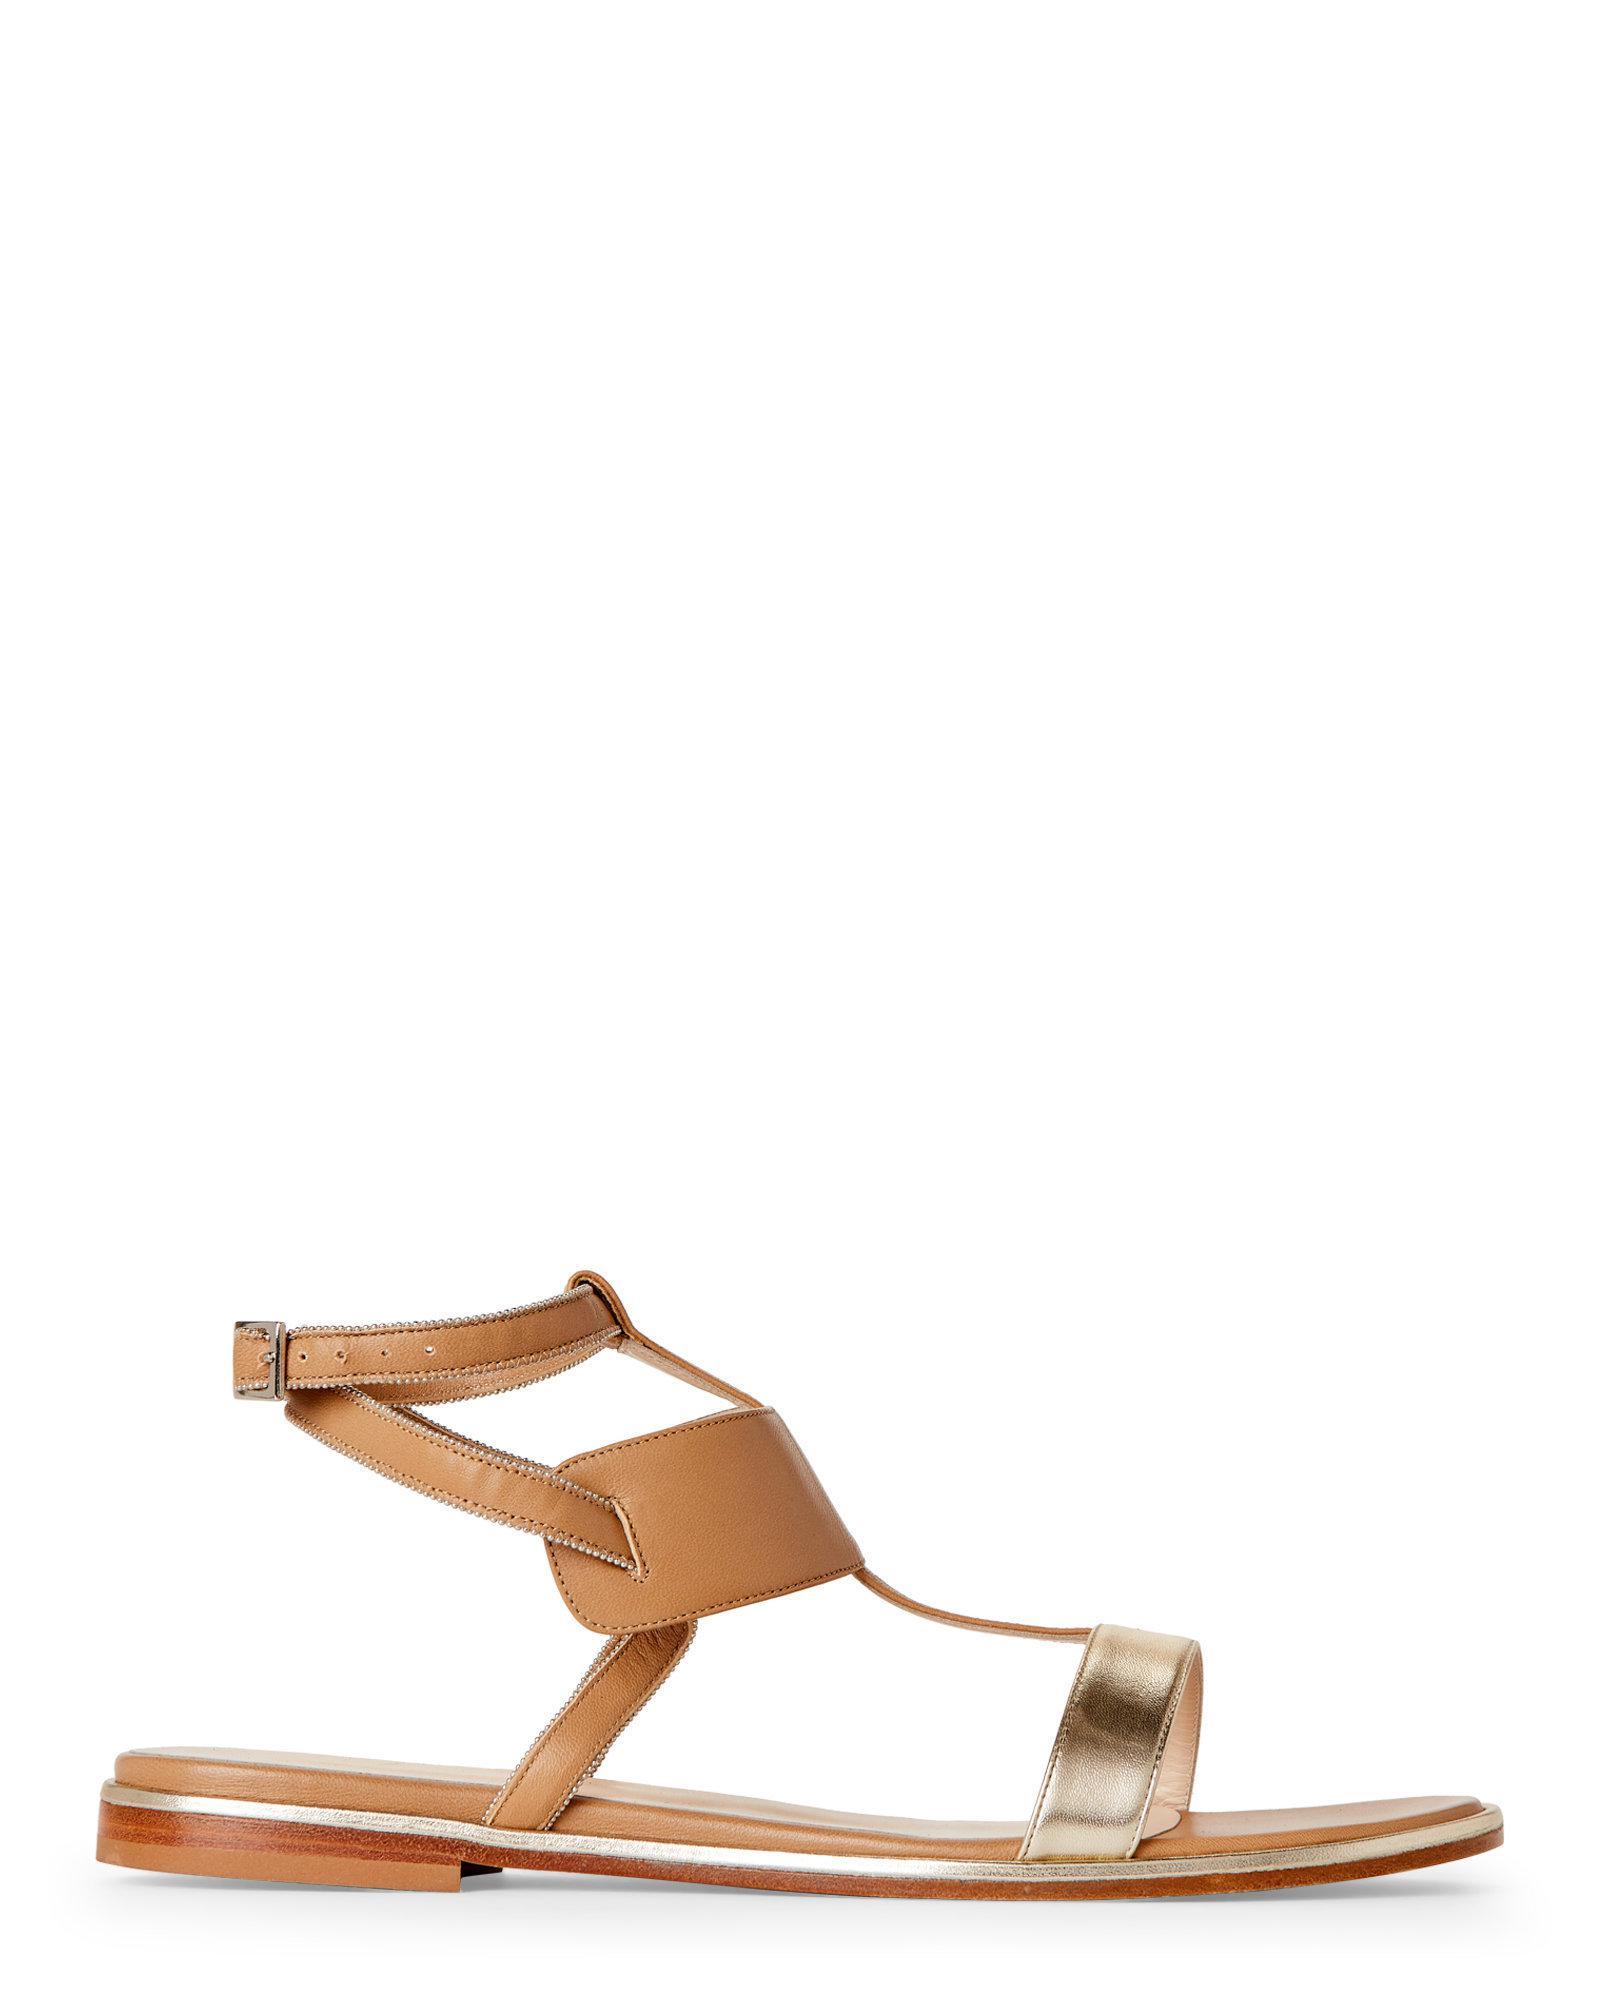 8d3235aa6c90 Lyst - Fabiana Filippi Natural   Gold Leather T-strap Flat Sandals